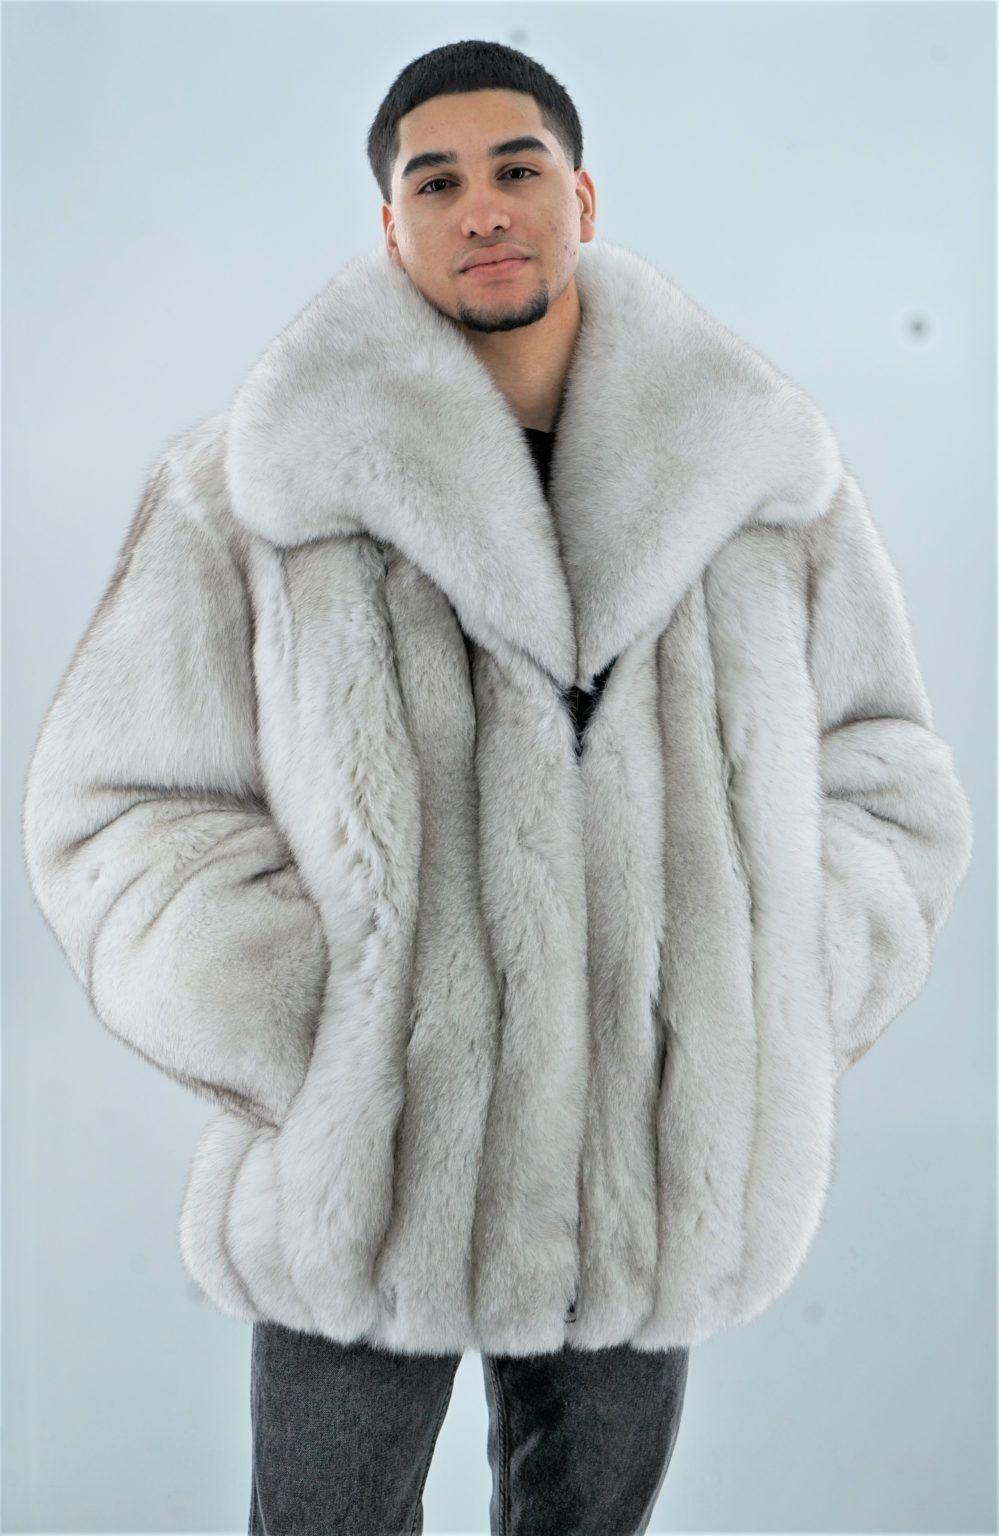 Fur Coats Jackets For Men Best Collection Of Men S Fur Coat Faux Fur Coat Men Mens Fur Coat Mens Fur [ 1536 x 999 Pixel ]